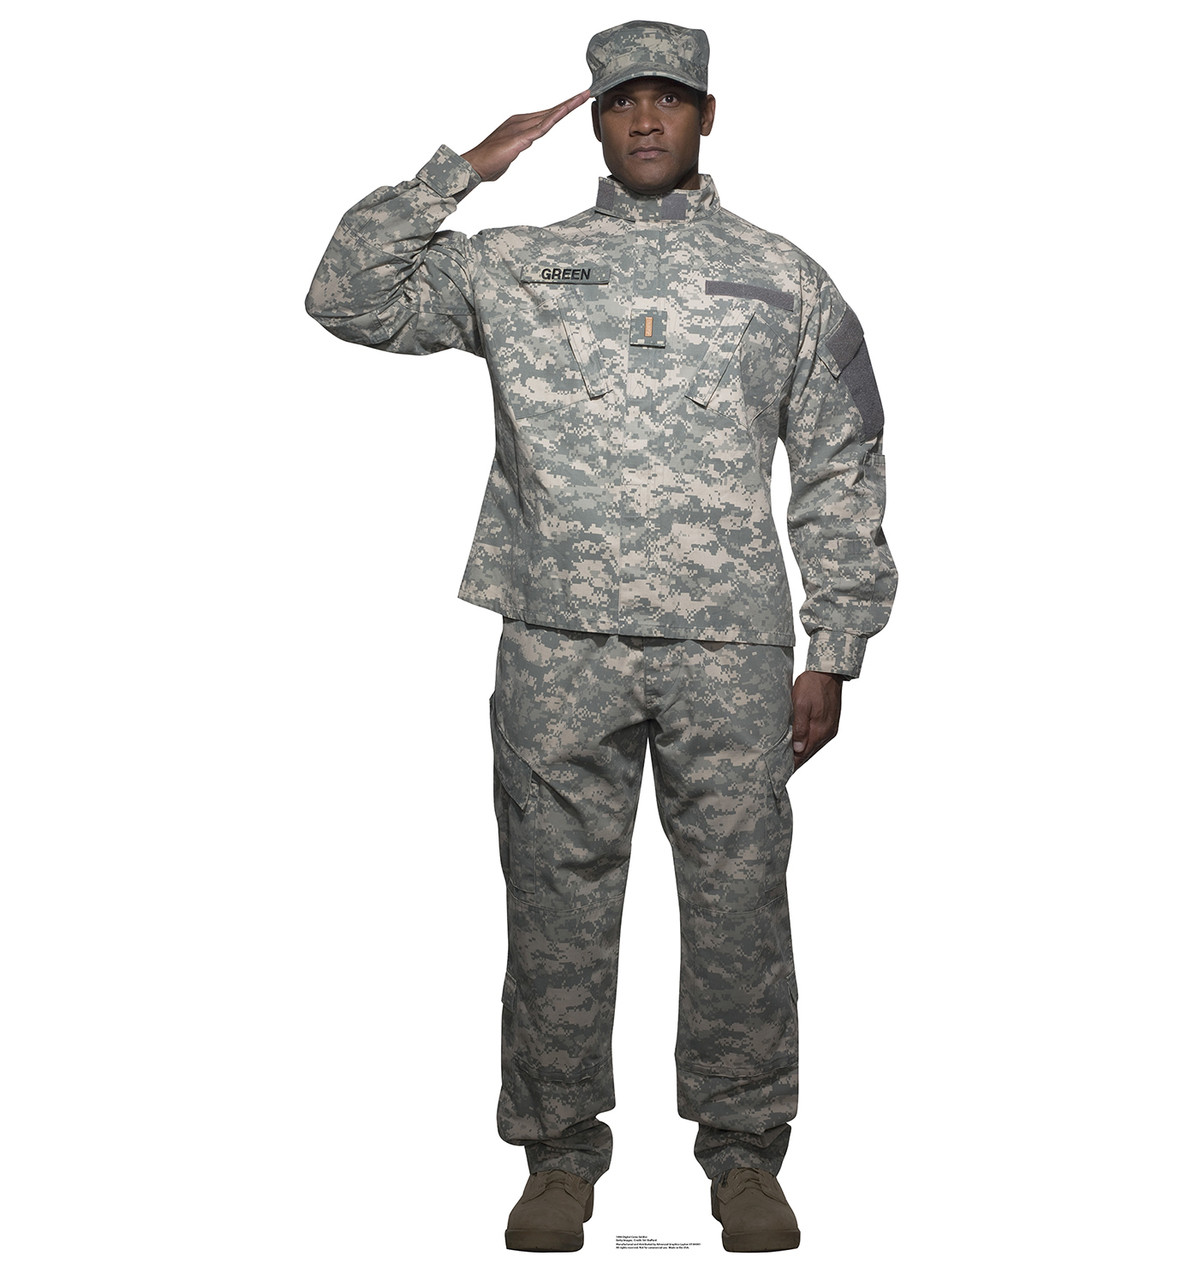 Life-size Digital Camo Soldier Cardboard Standup